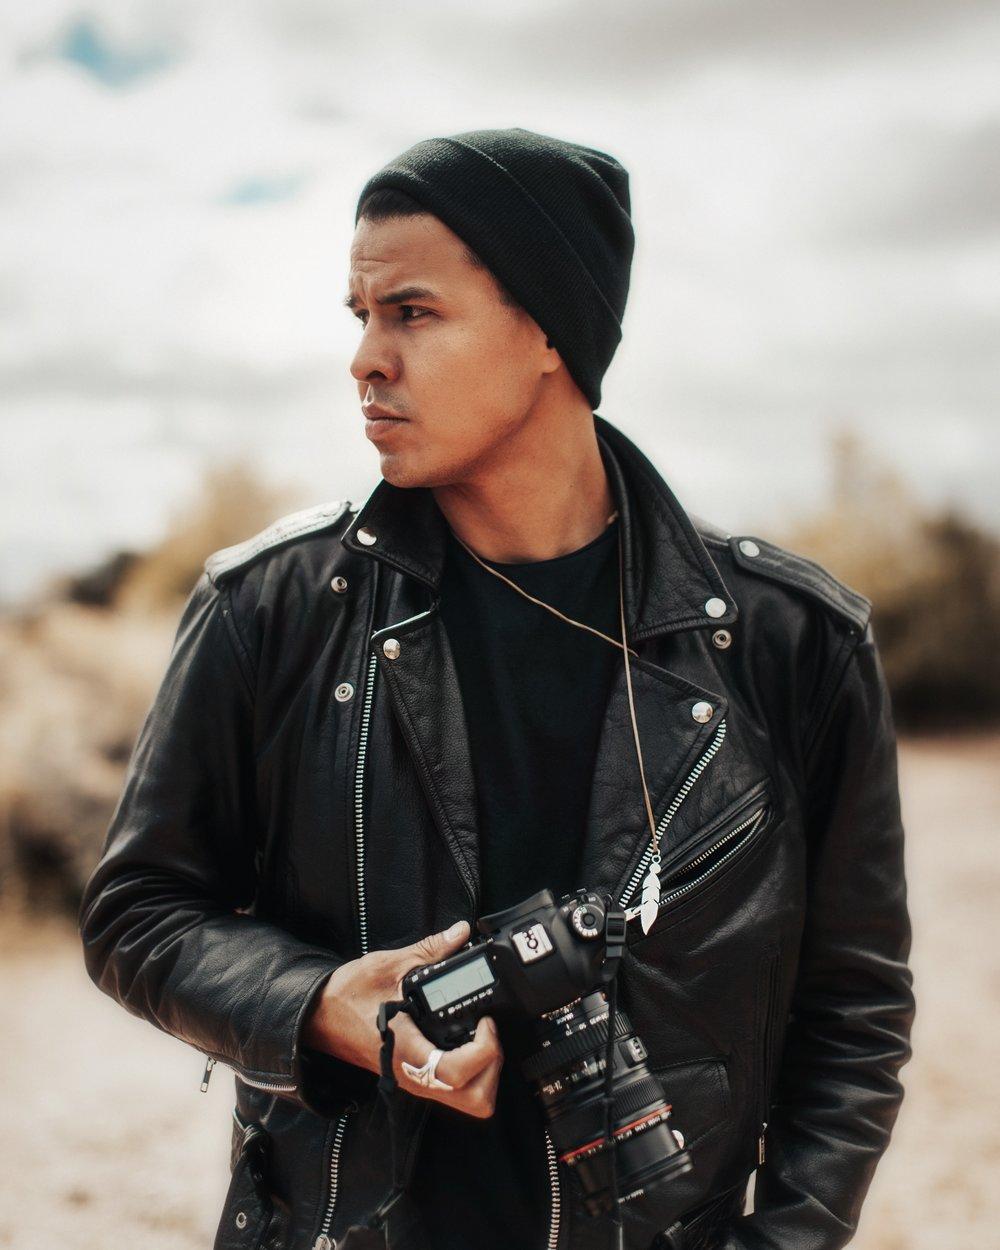 photograher -